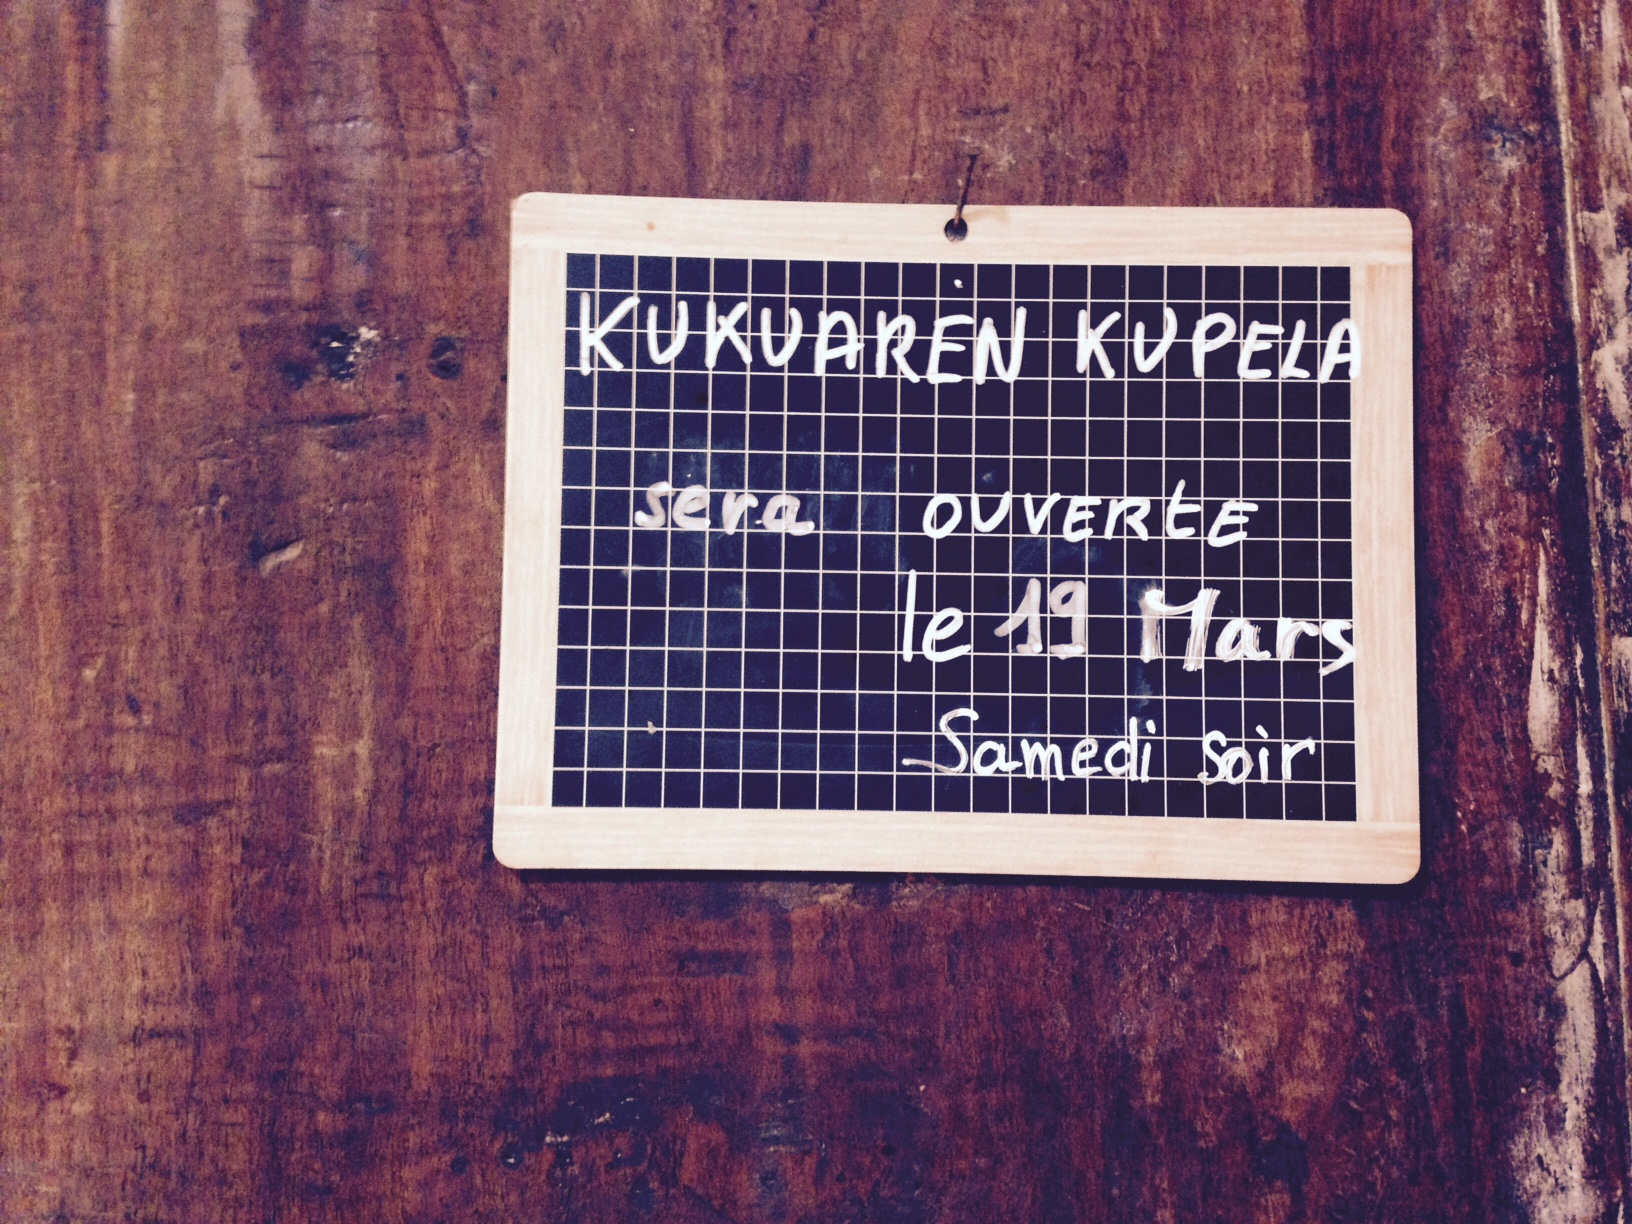 Kukuaren Kupela le samedi 21 mars à partir de 20h00.